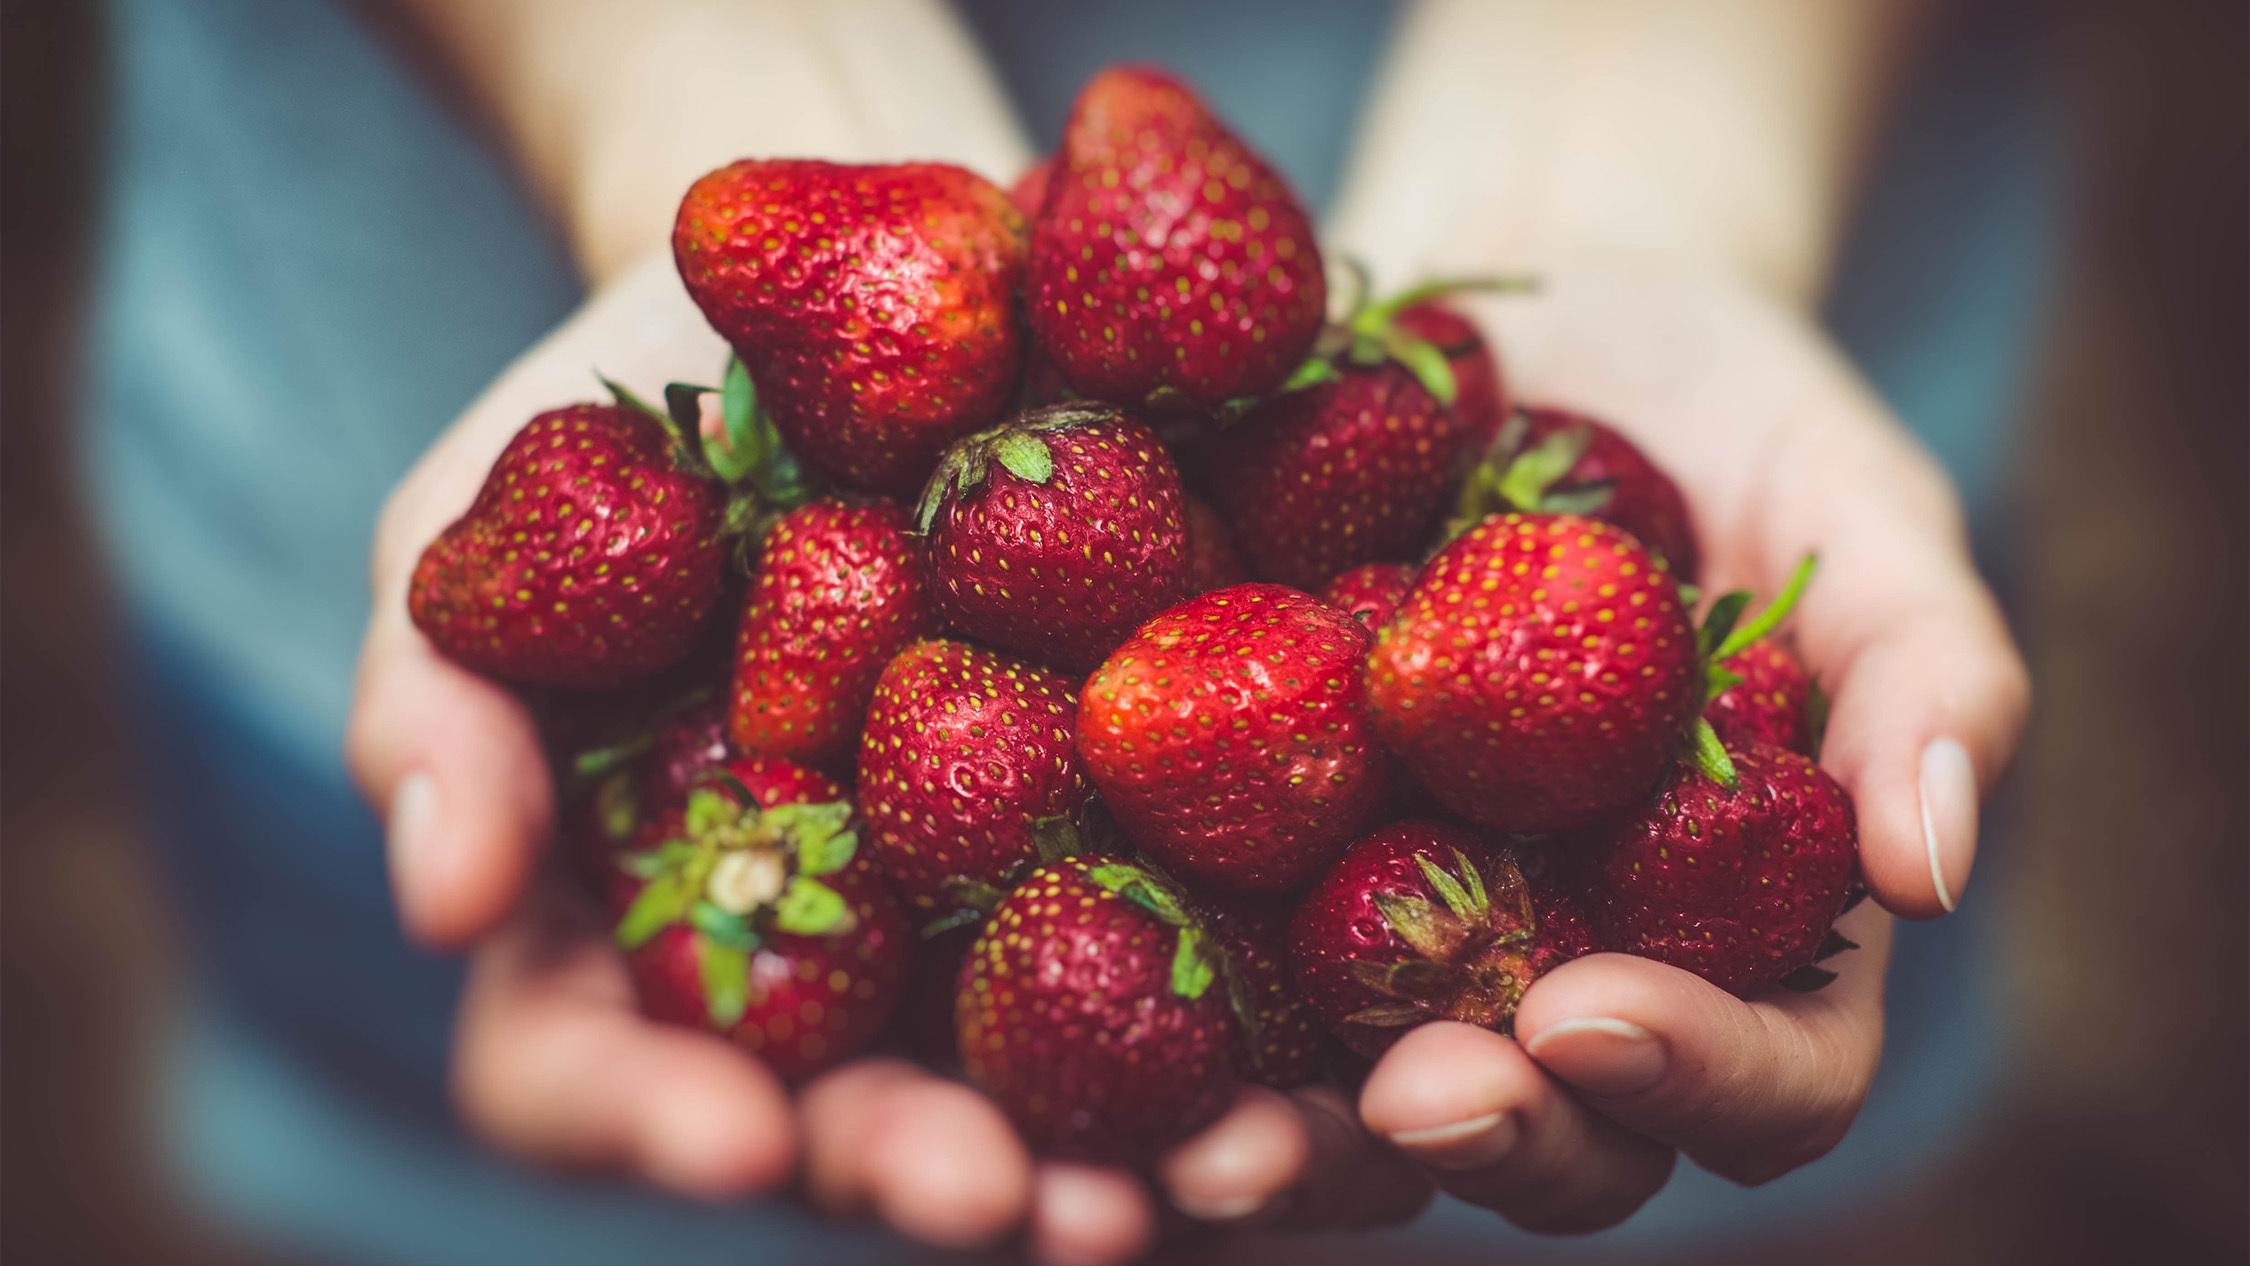 Generic strawberries